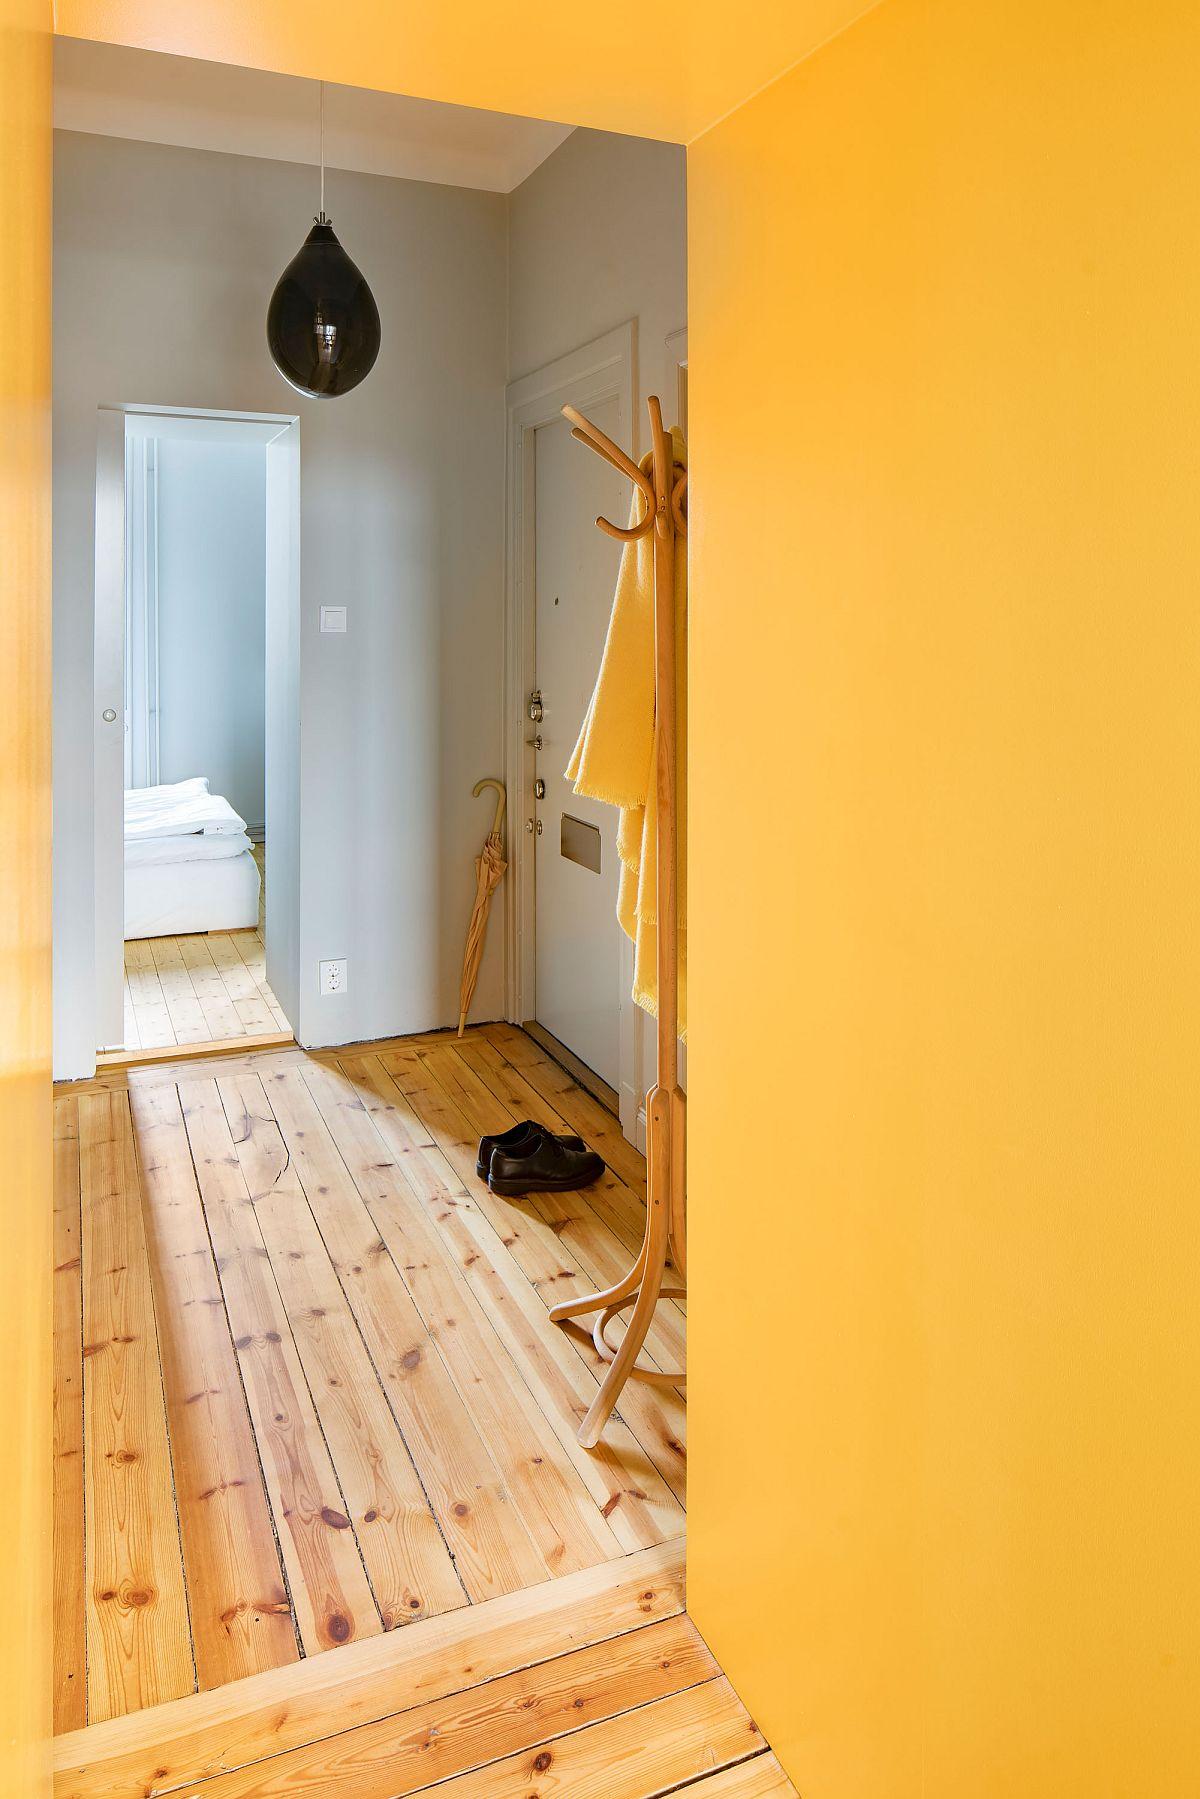 adelaparvu.com despre locuinta 80 mp, Suedia, design arh. David Lookofsky, Foto Mattias Hamren (7)